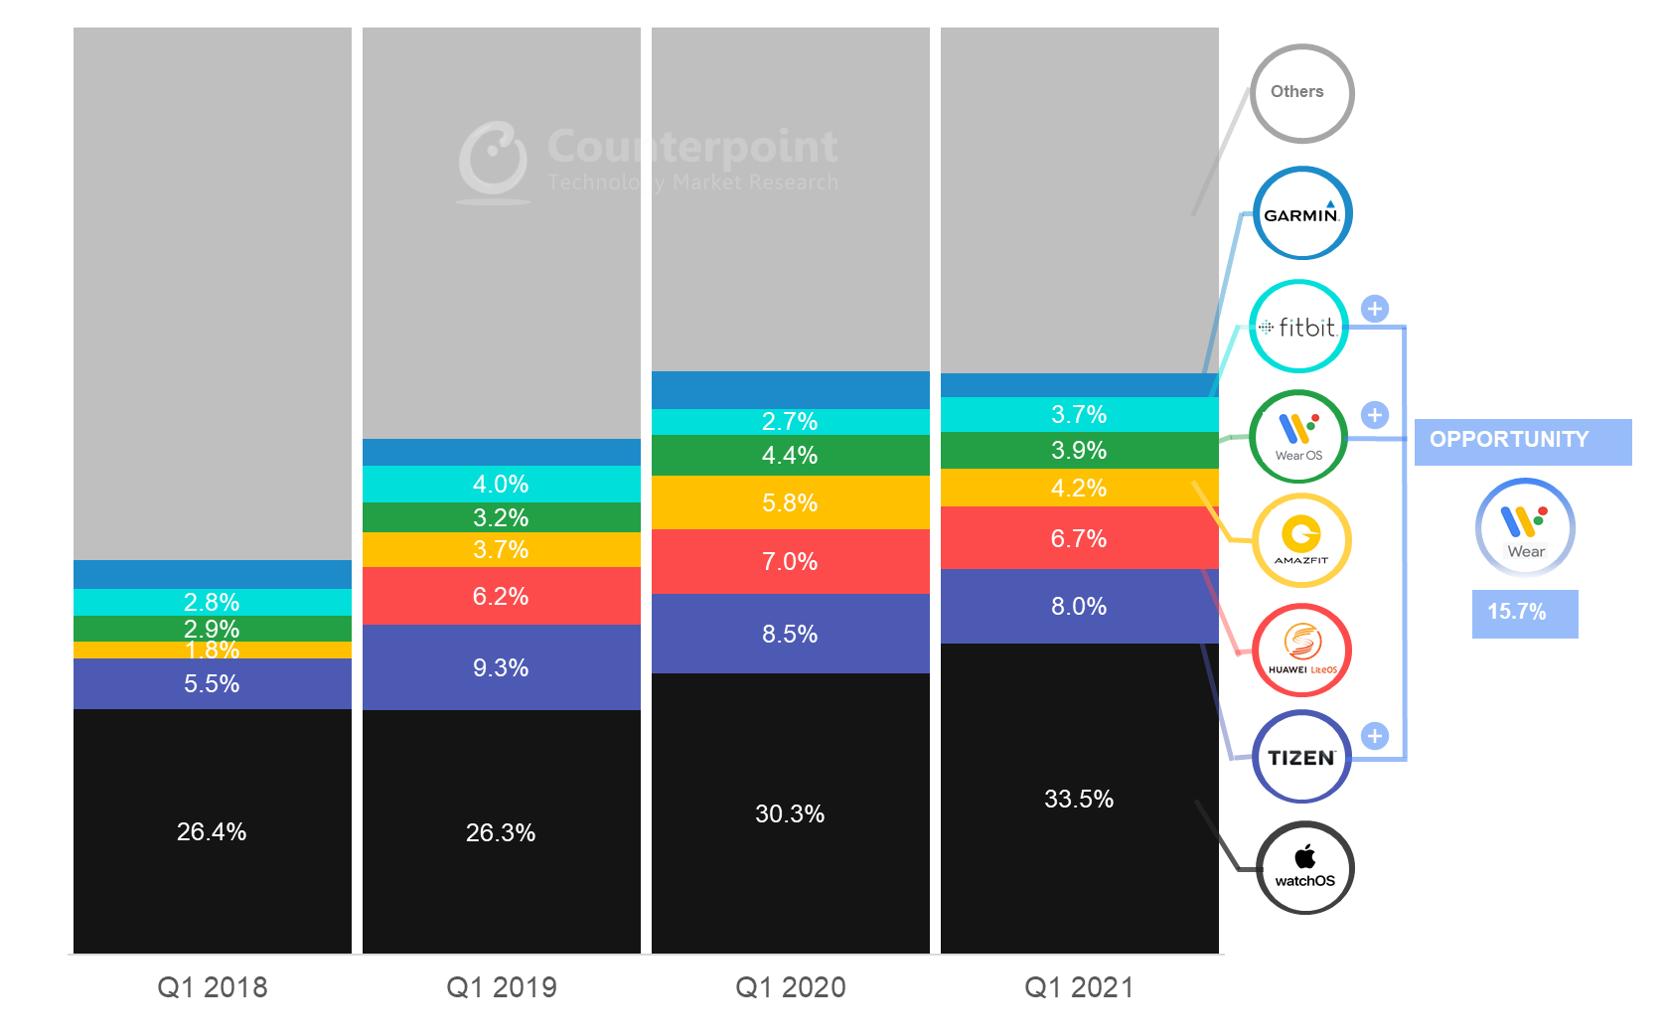 Counterpoint对近年来智能手表操作系统市场占比调查